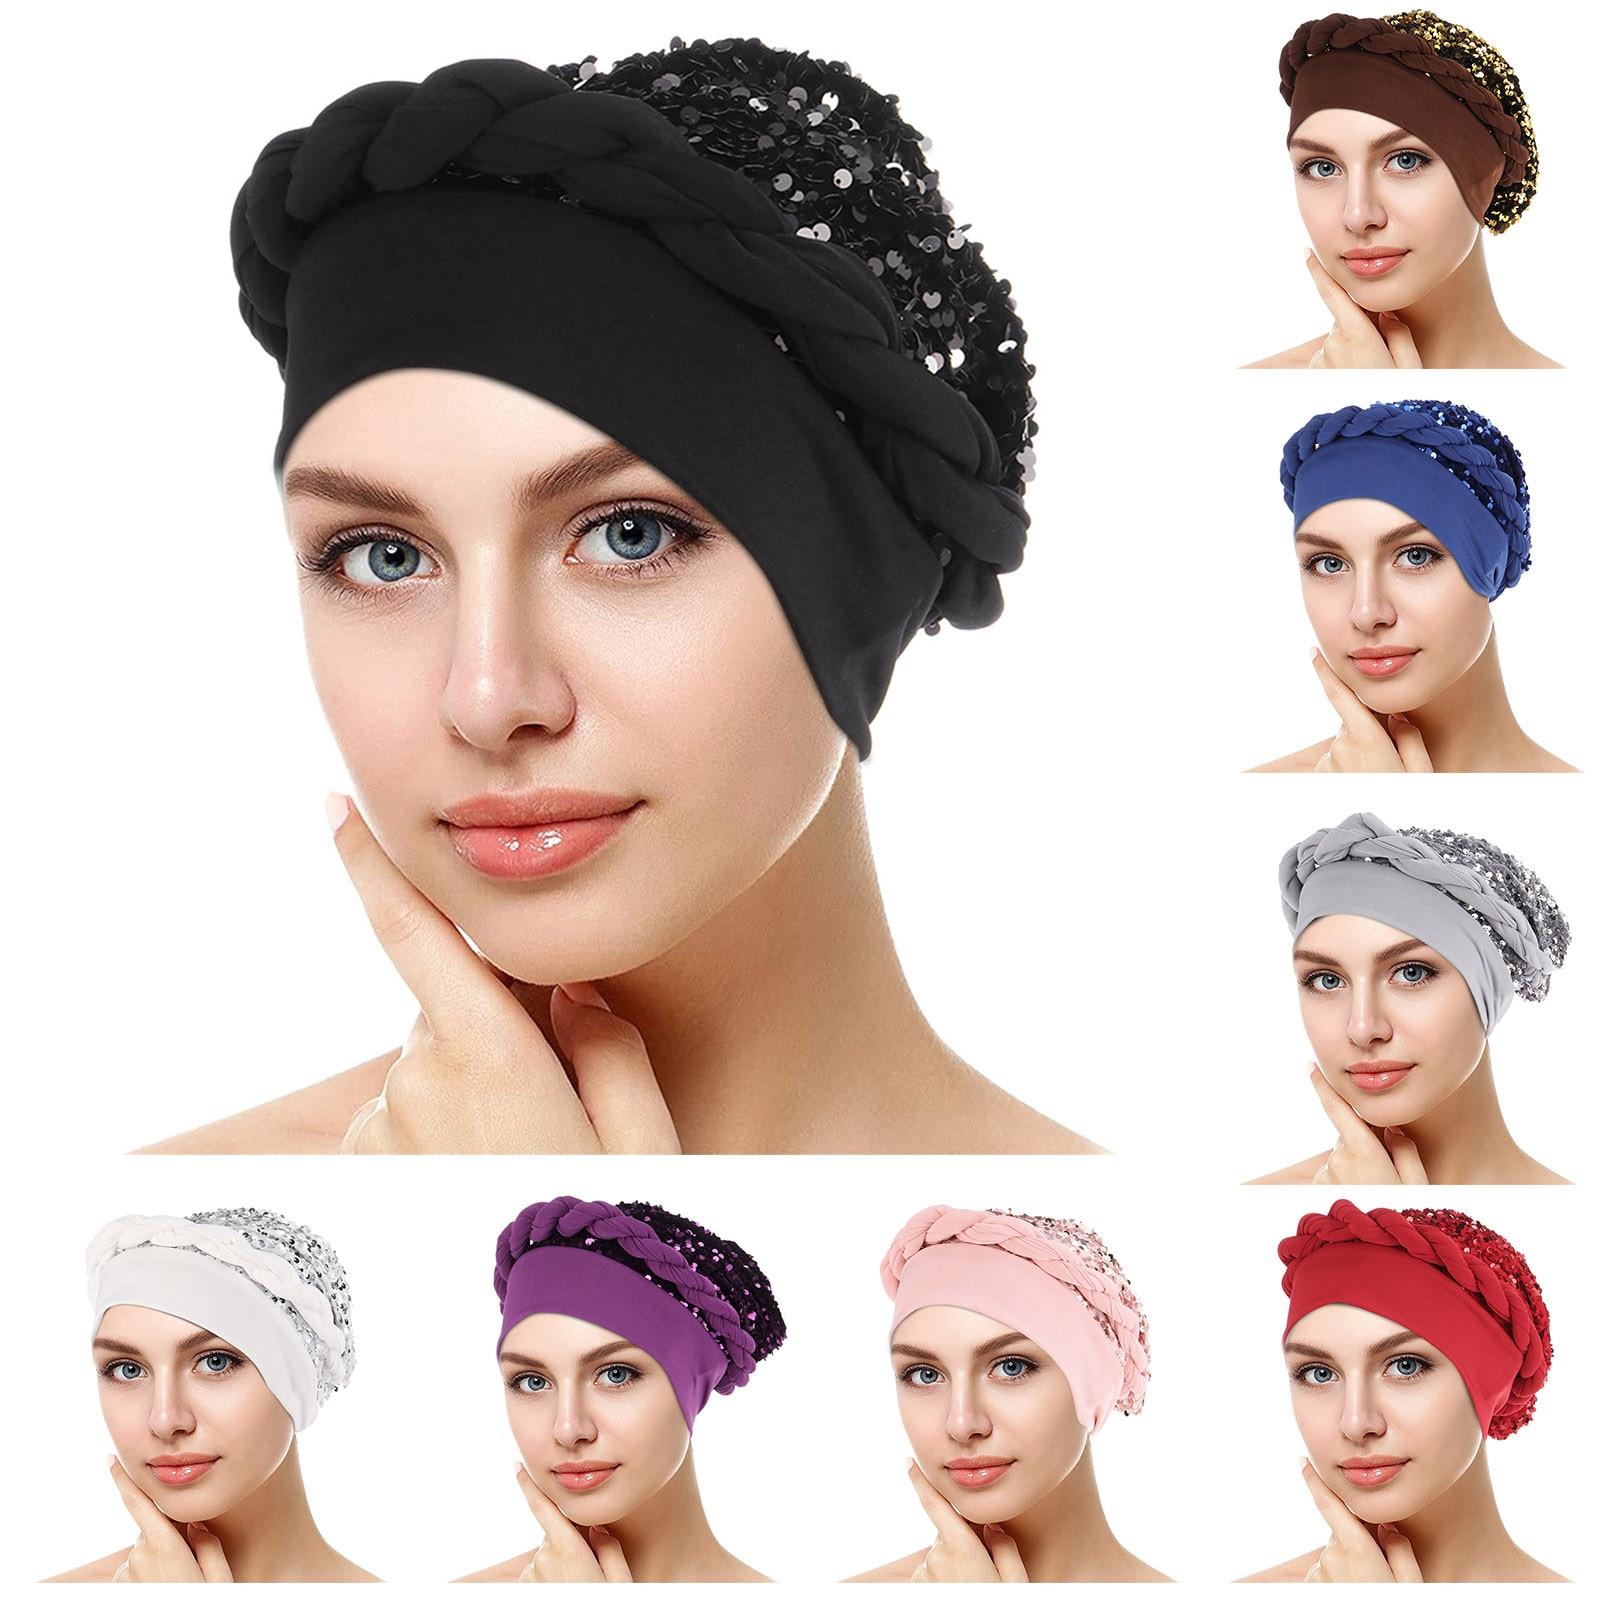 кепка мужская0кепка мужская1 Chemo Cancer Head Hat Cap Ethnic Bohemian Pre-T